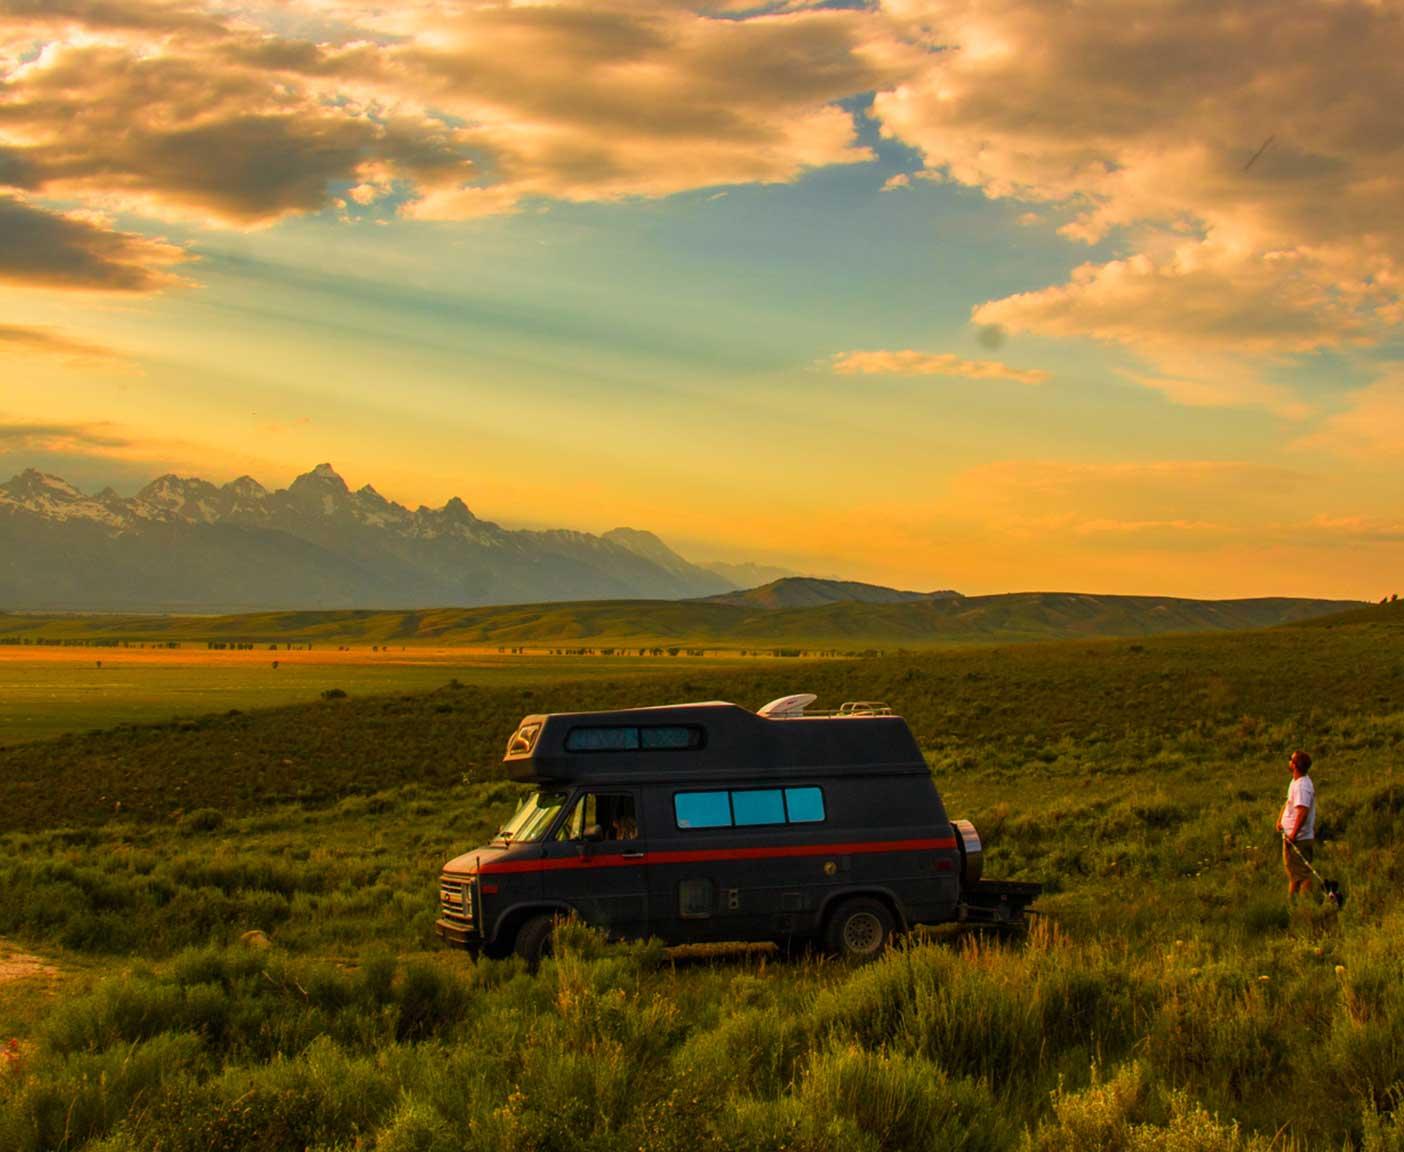 chevrolet-g20-wohnmobil-camper-vanlife